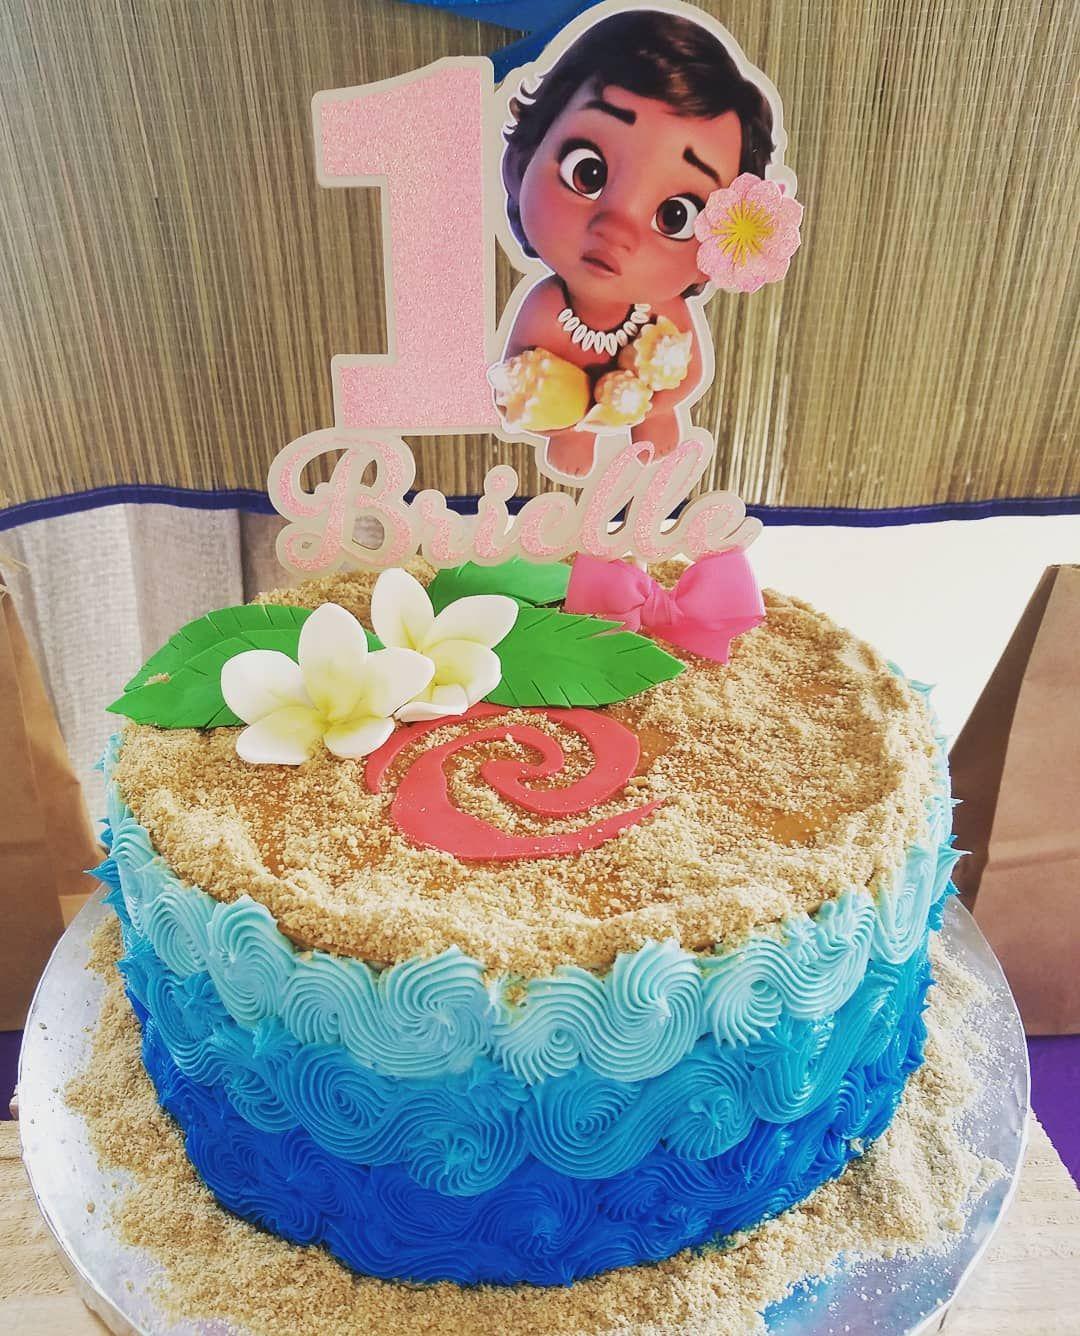 Moana Birthday Birthdaygirl Birthdays Firstbirthday Party Partyplanner Cake Moana Birthday Party Cake Moana Theme Birthday Moana Birthday Party Theme